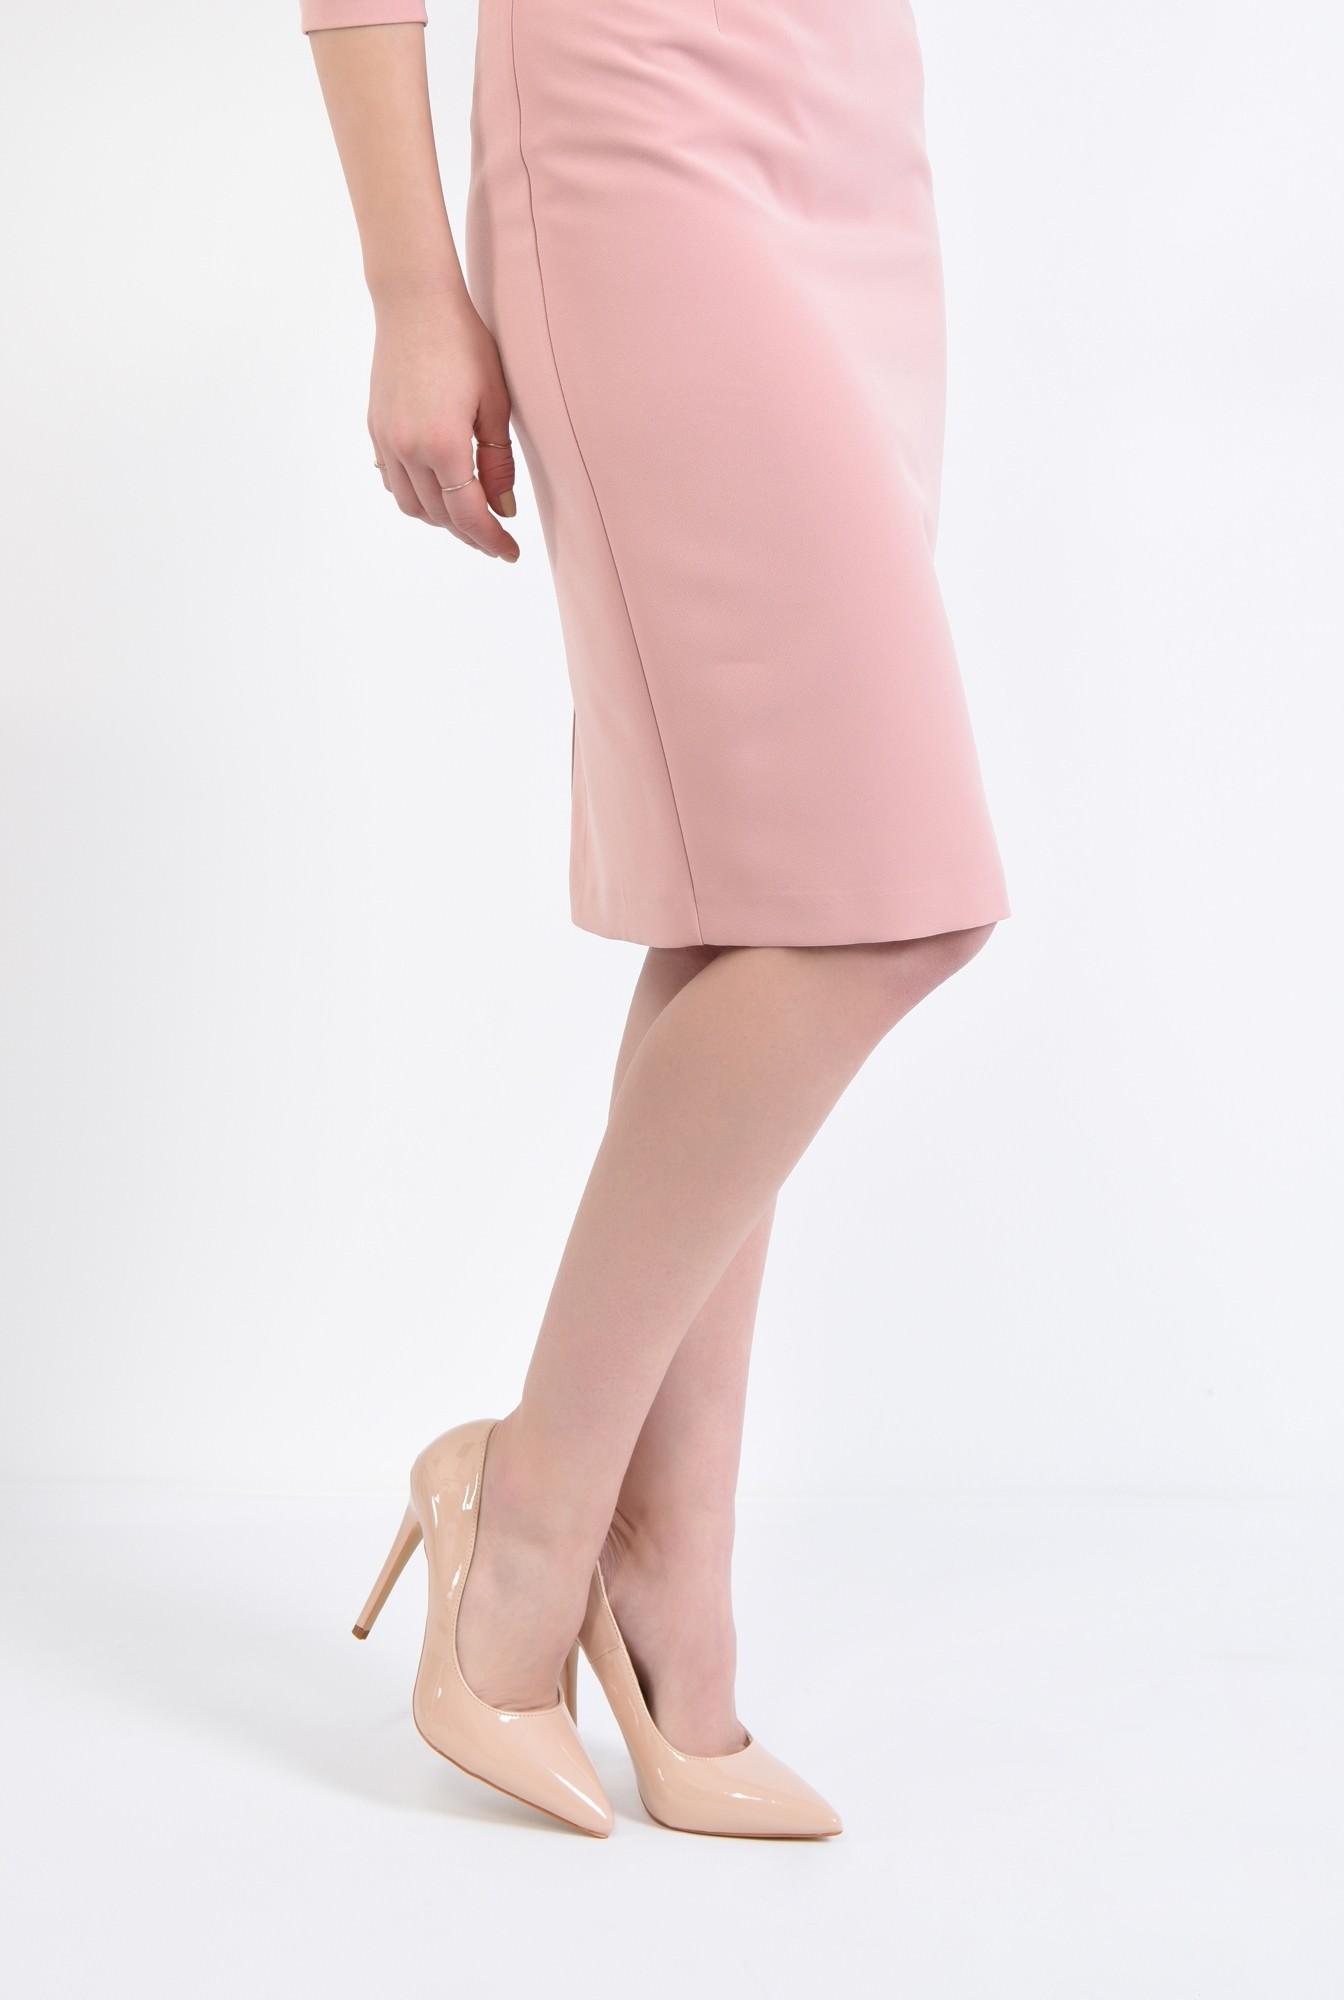 4 - pantofi eleganti, crem, toc inalt, varf ascutit